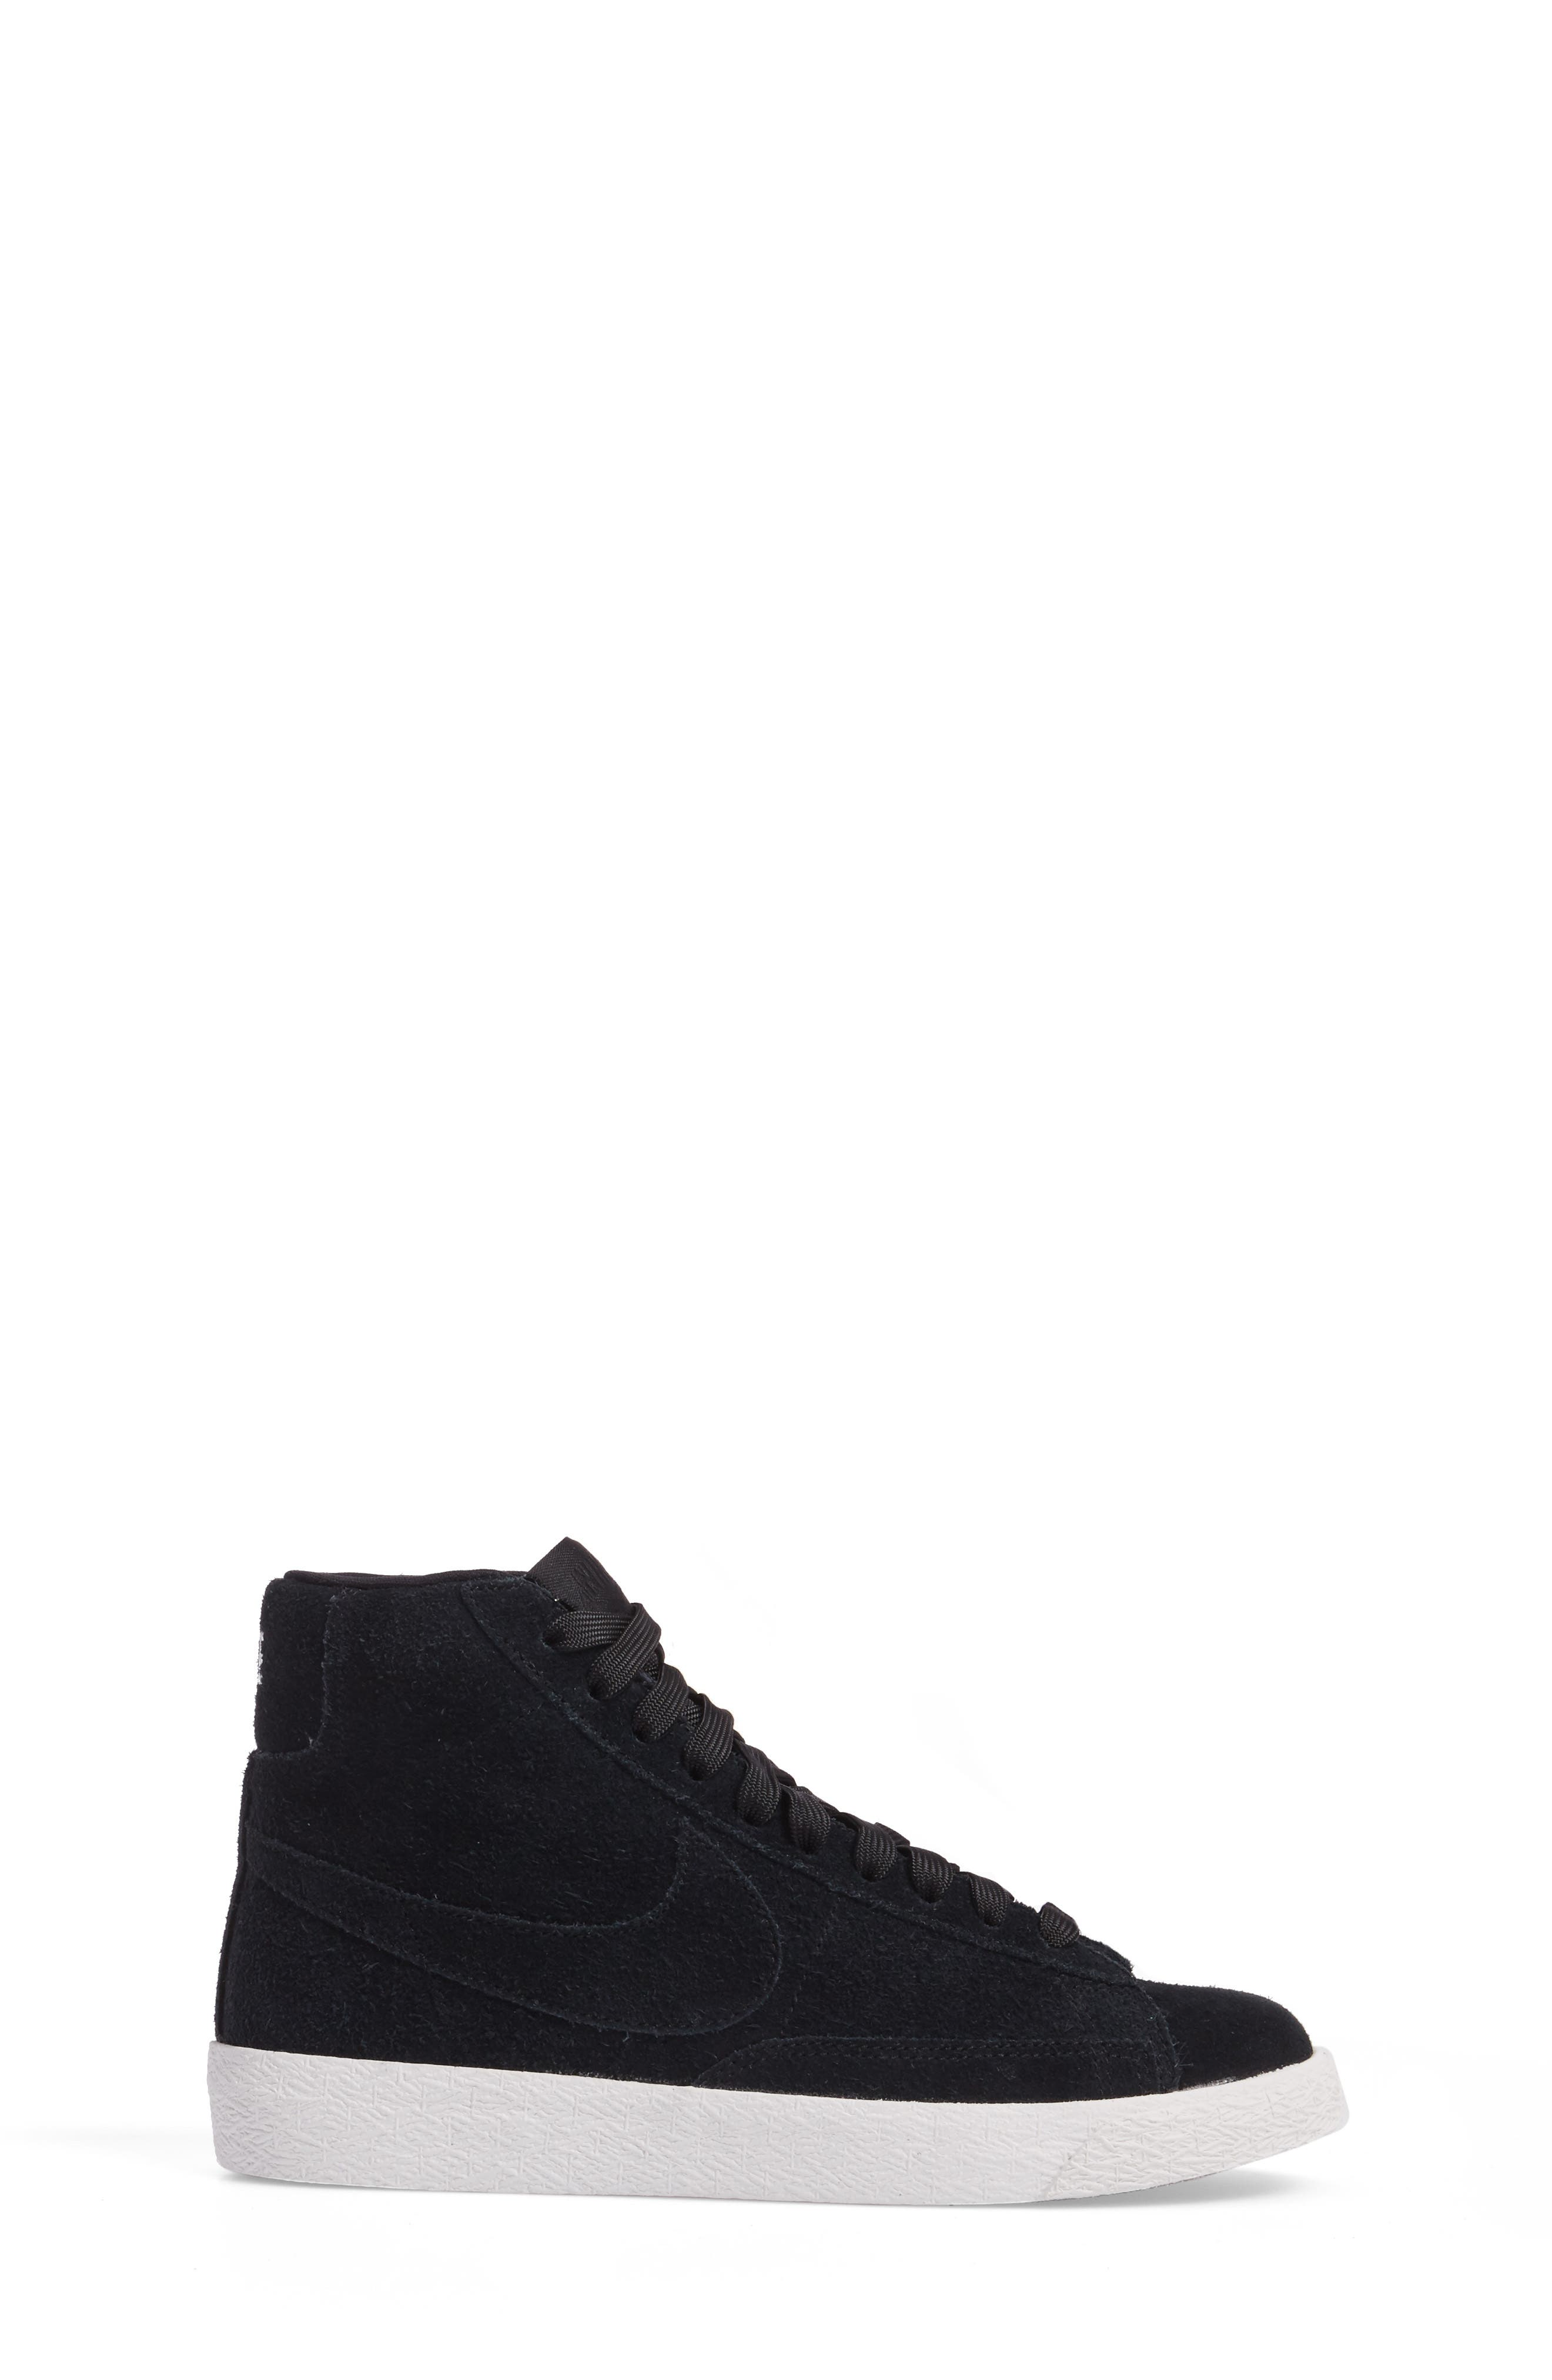 Blazer Mid High Top Sneaker,                             Alternate thumbnail 3, color,                             003